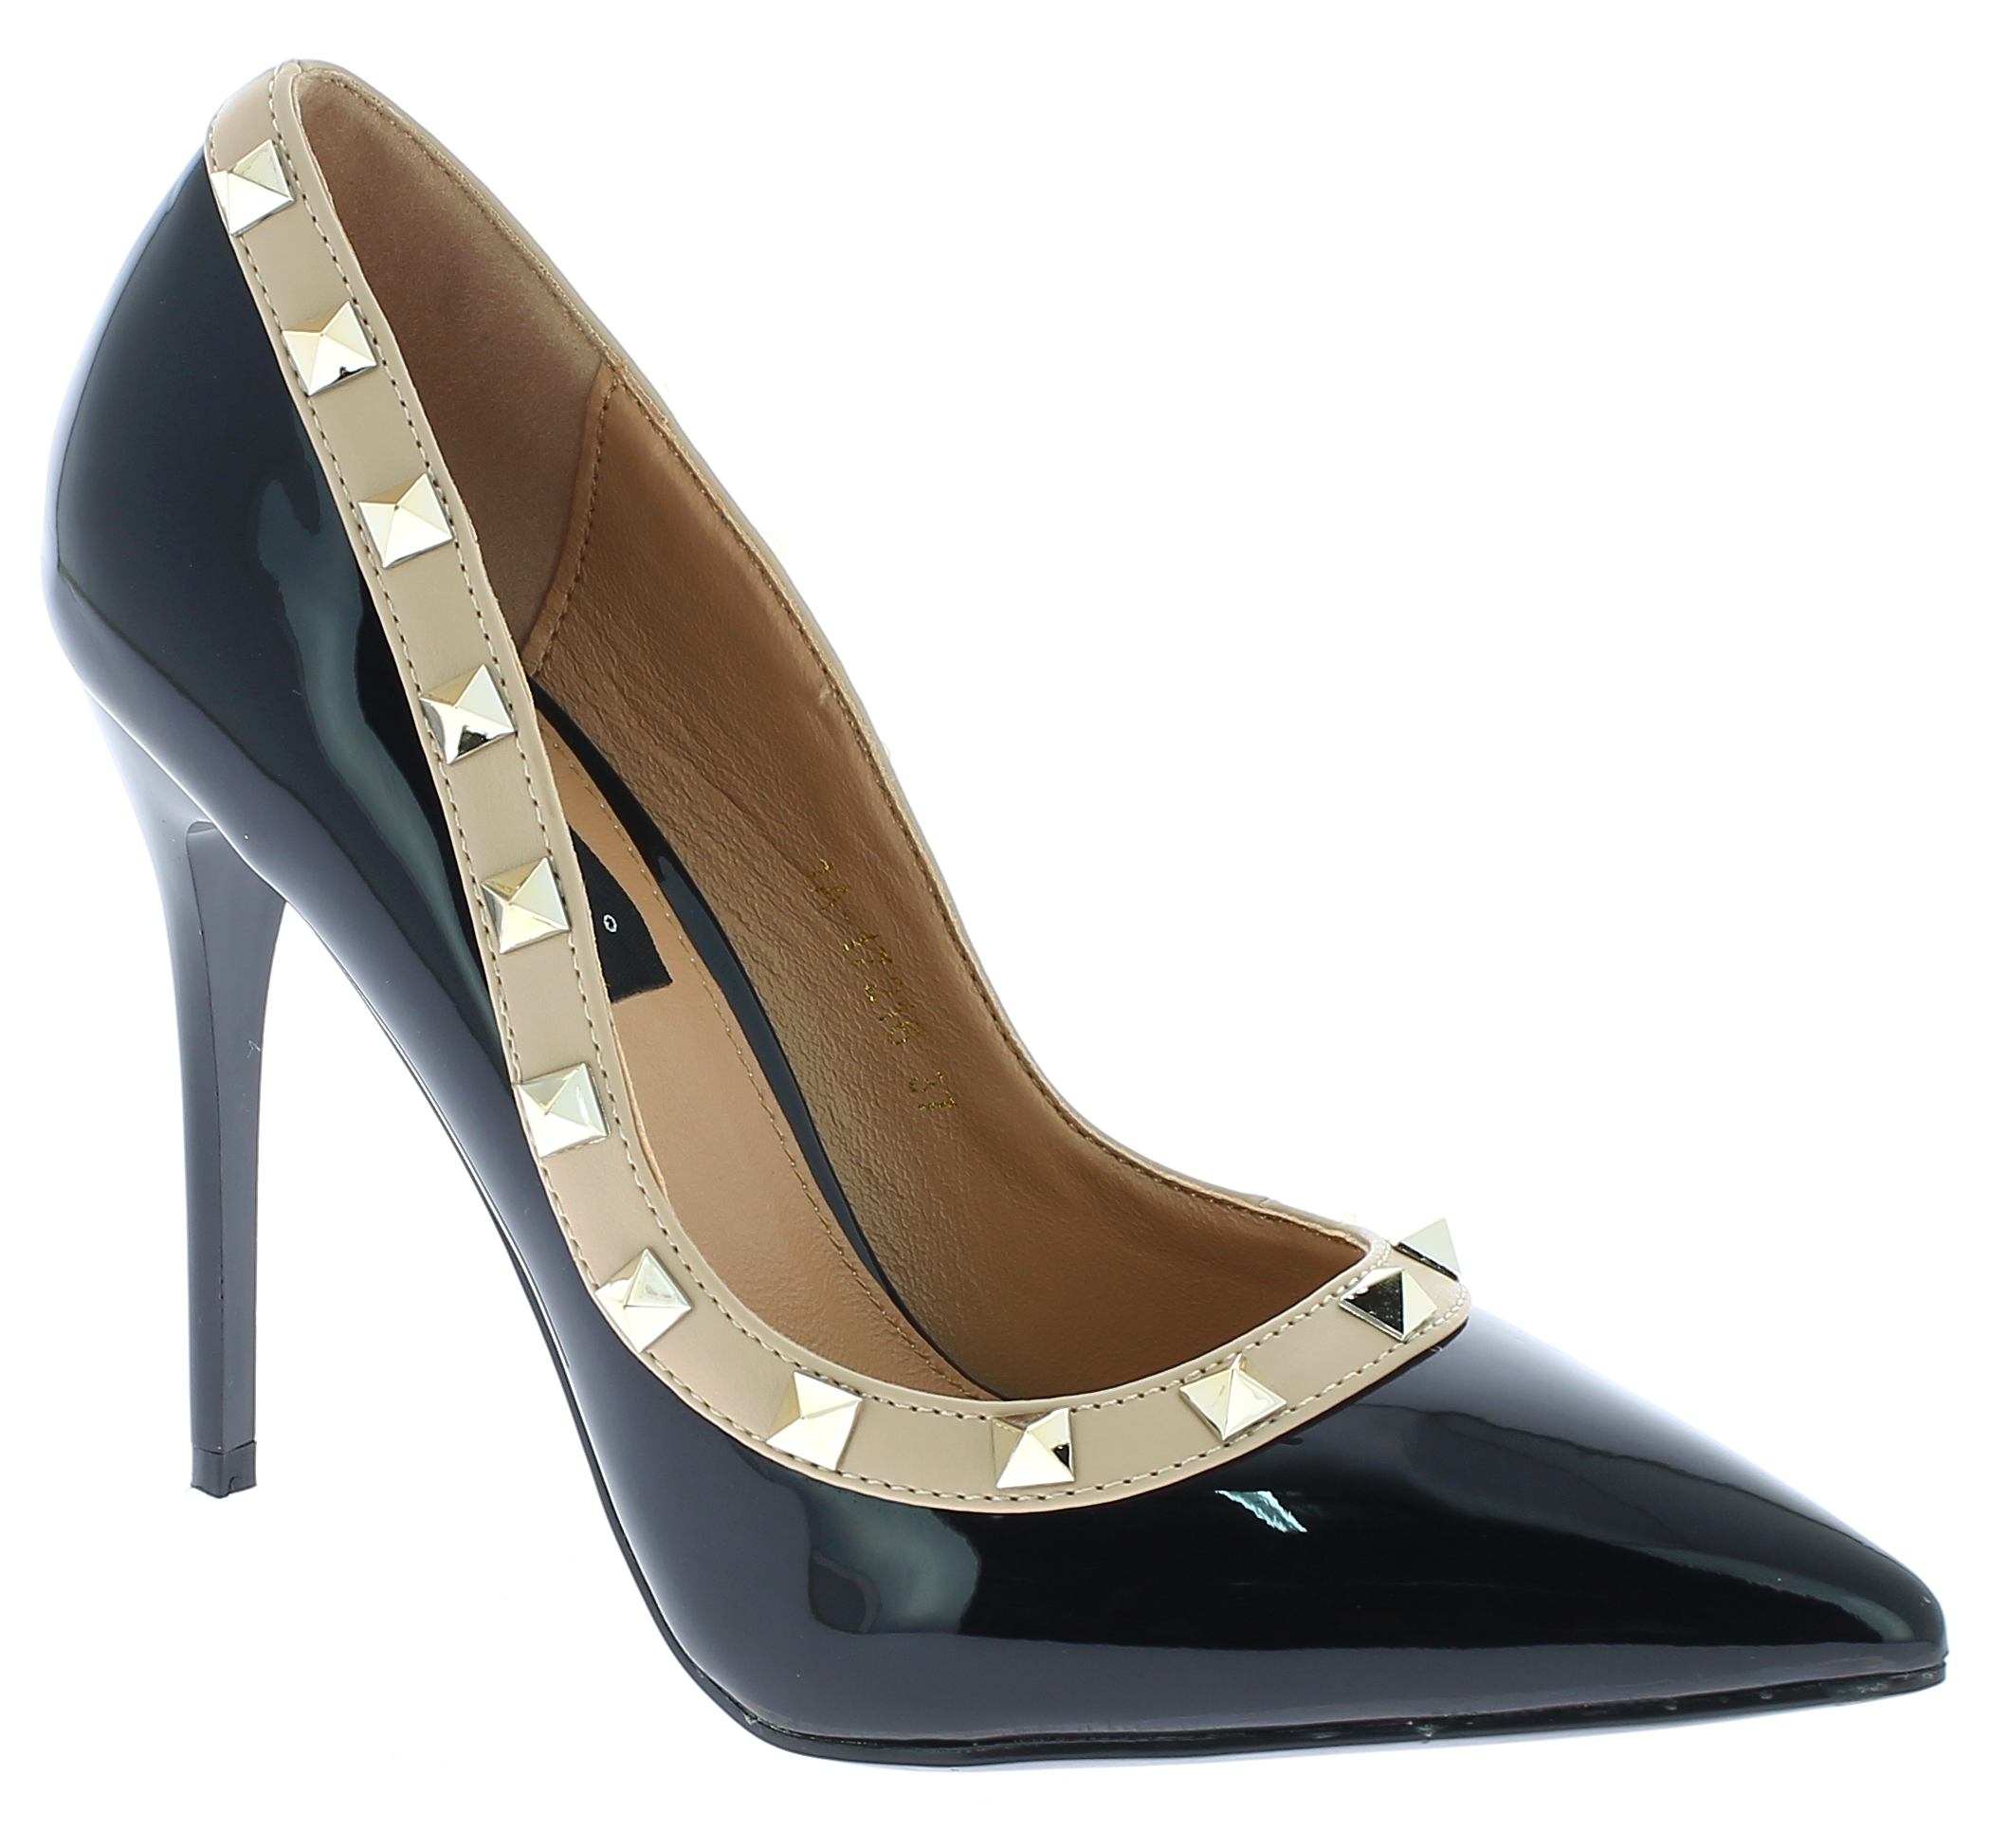 IQSHOES Γυναικεία Γόβα 1A17126 Μαύρο - IqShoes - 1A-17126 BLACK-black-37/1/15/27 παπούτσια  γόβες